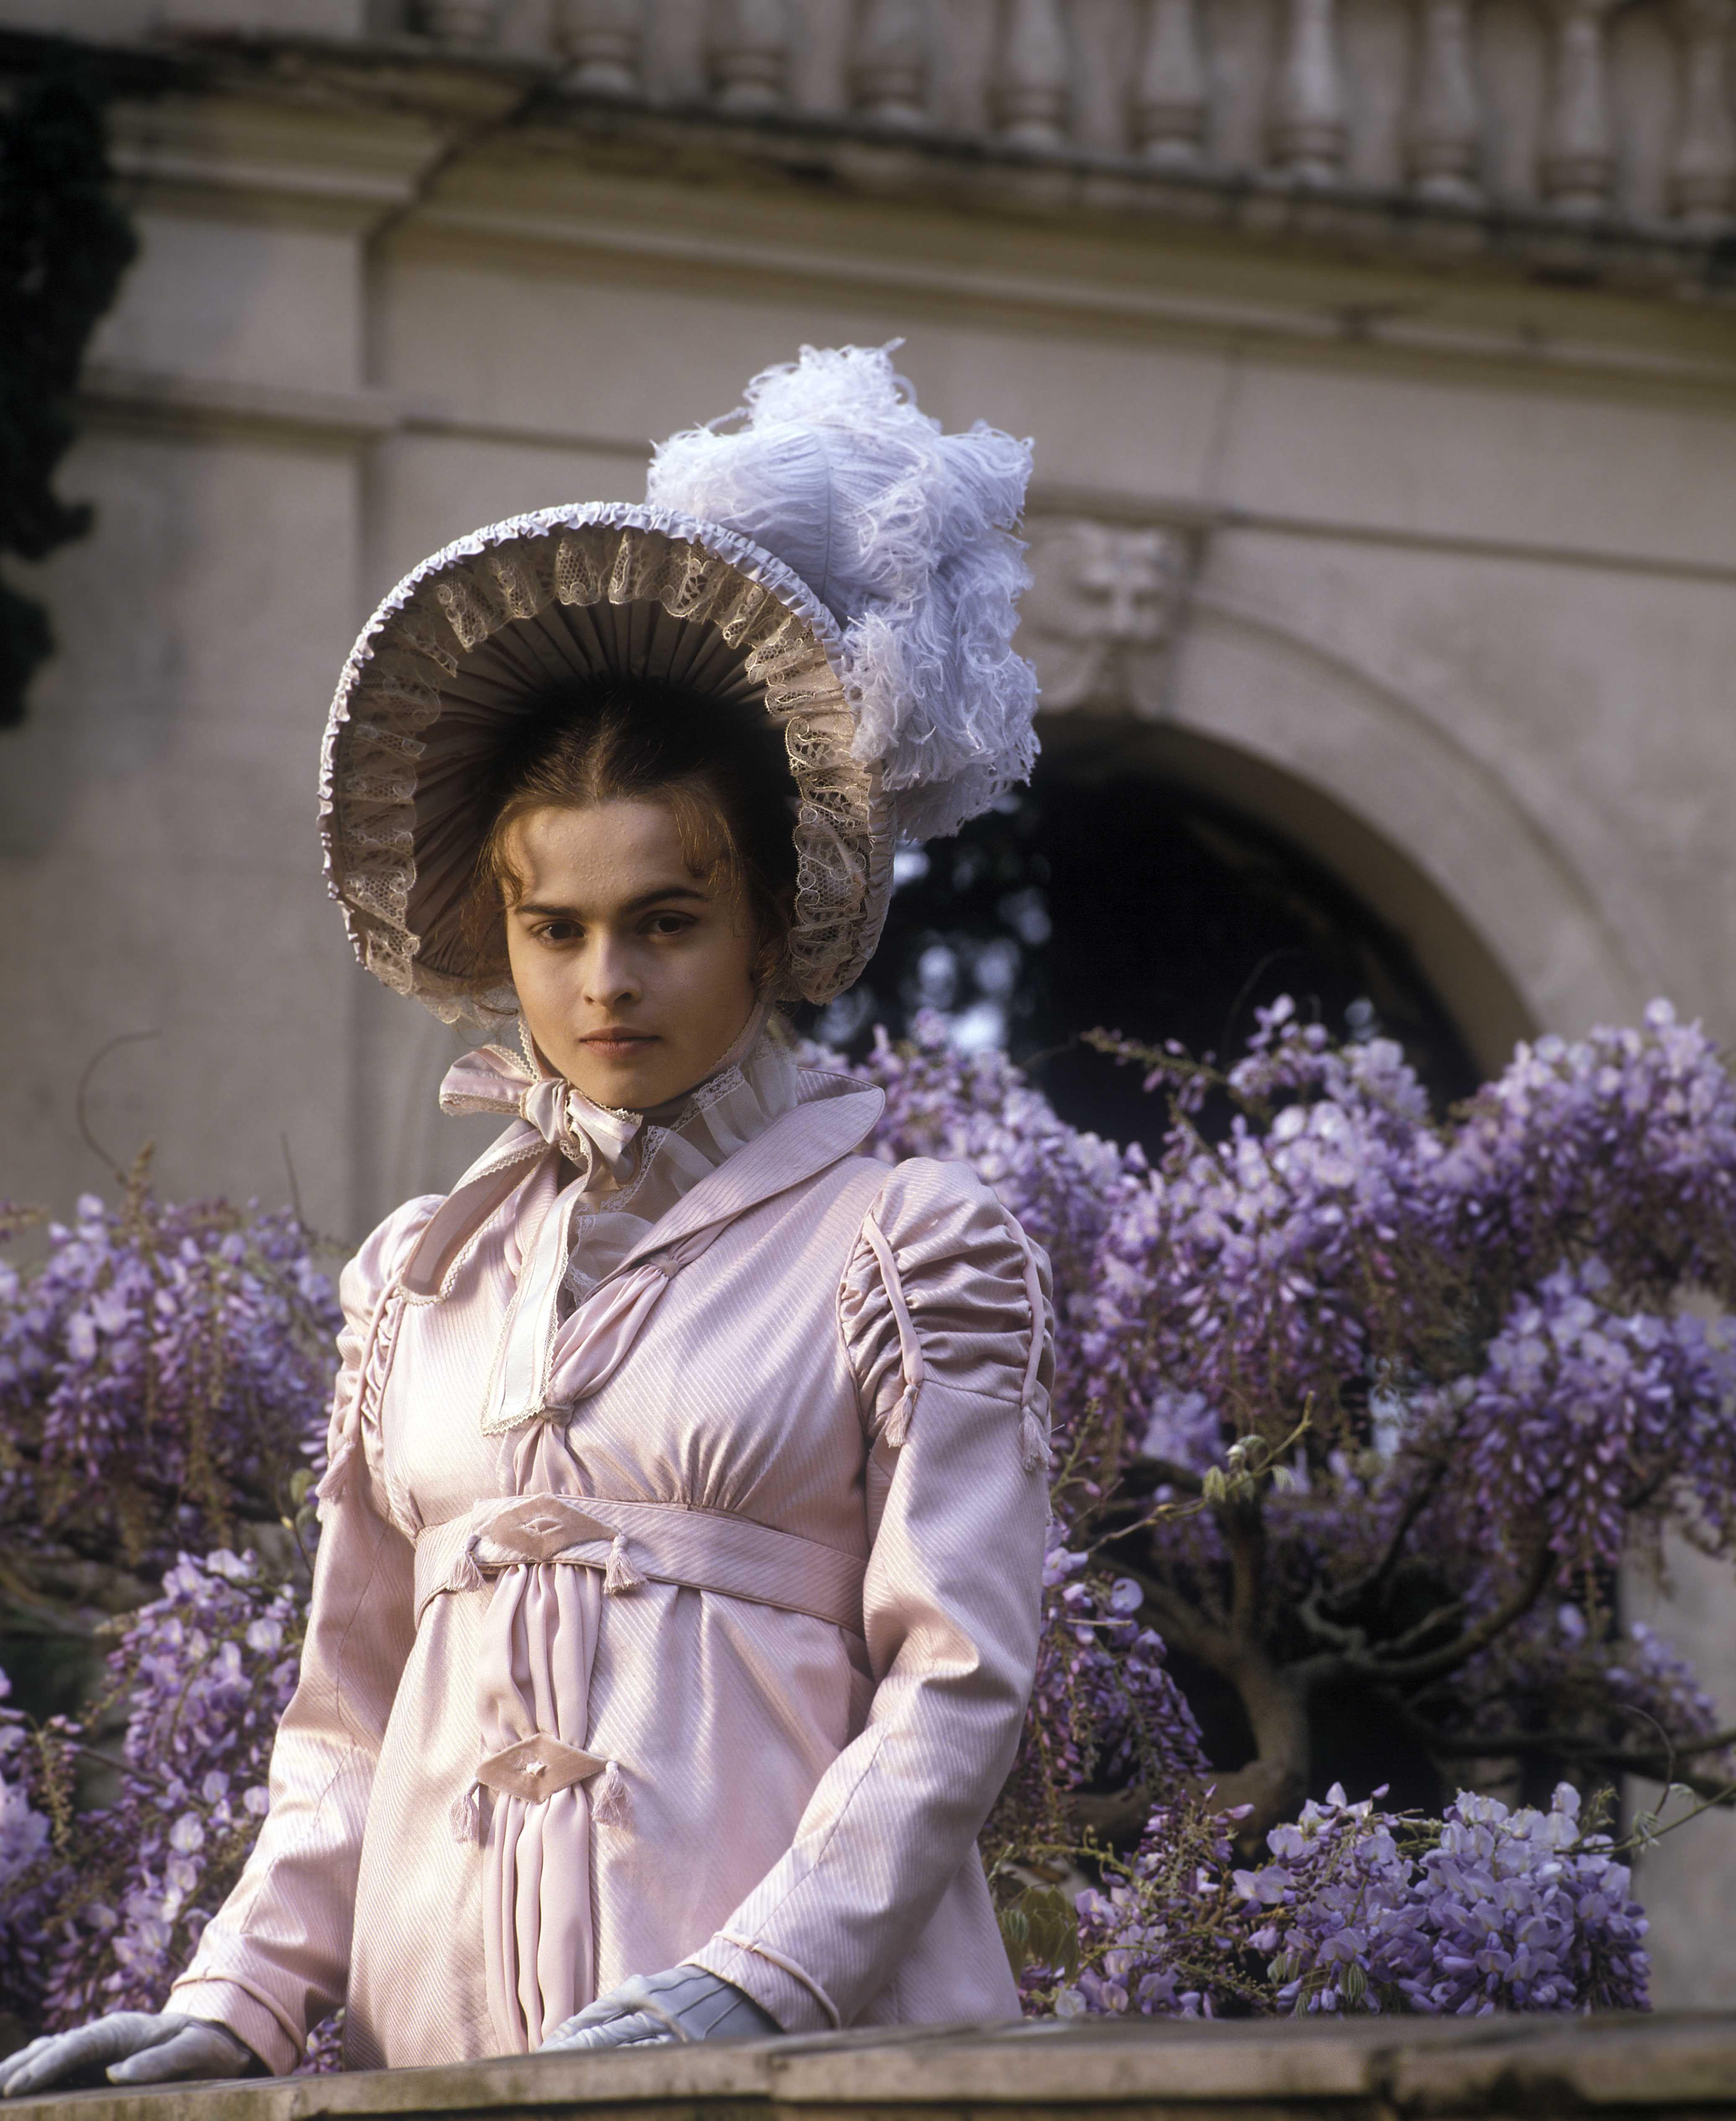 regency fashion in movie costume